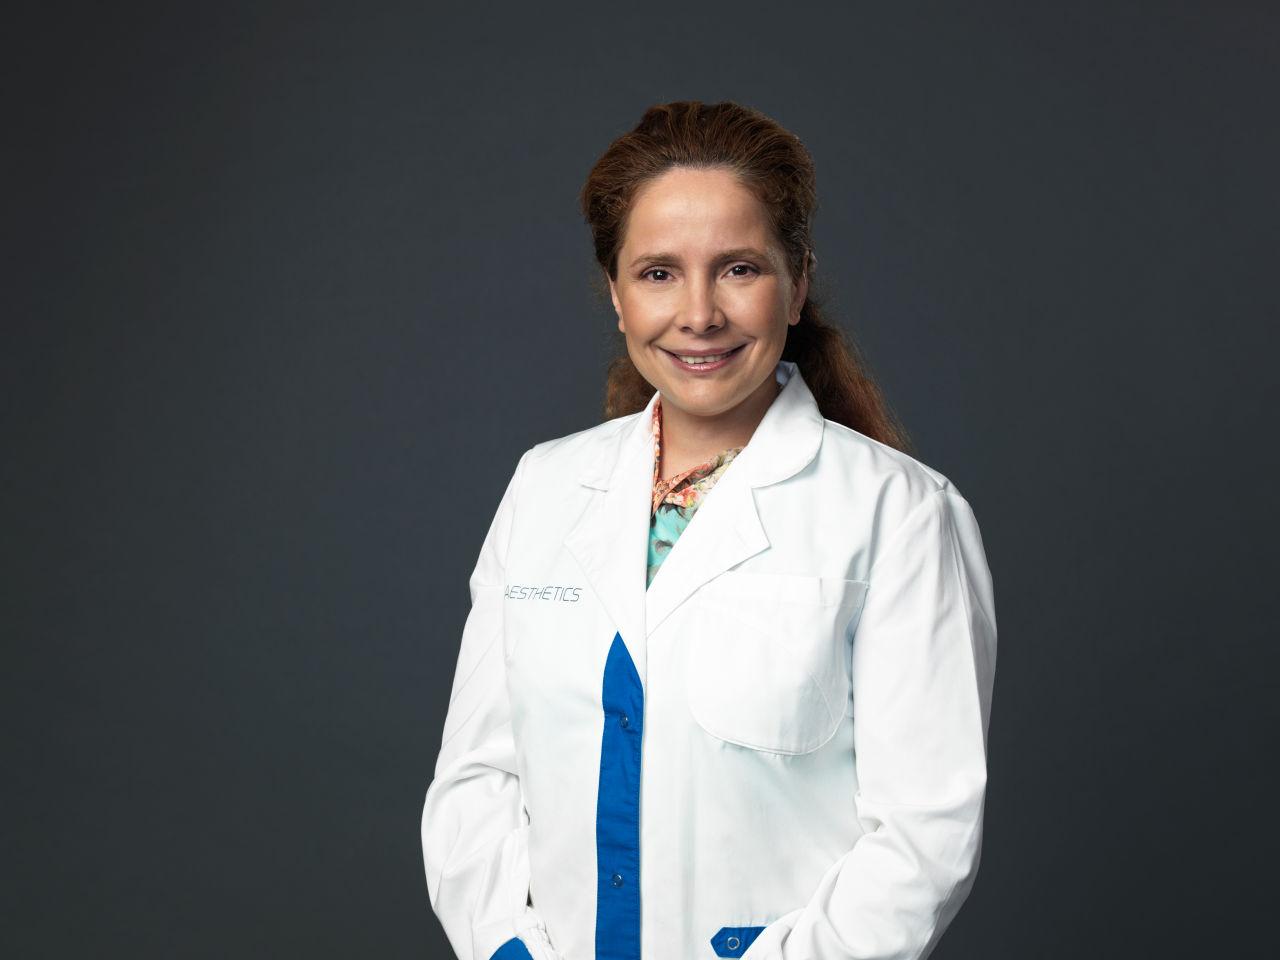 Vasilescu Gabriela